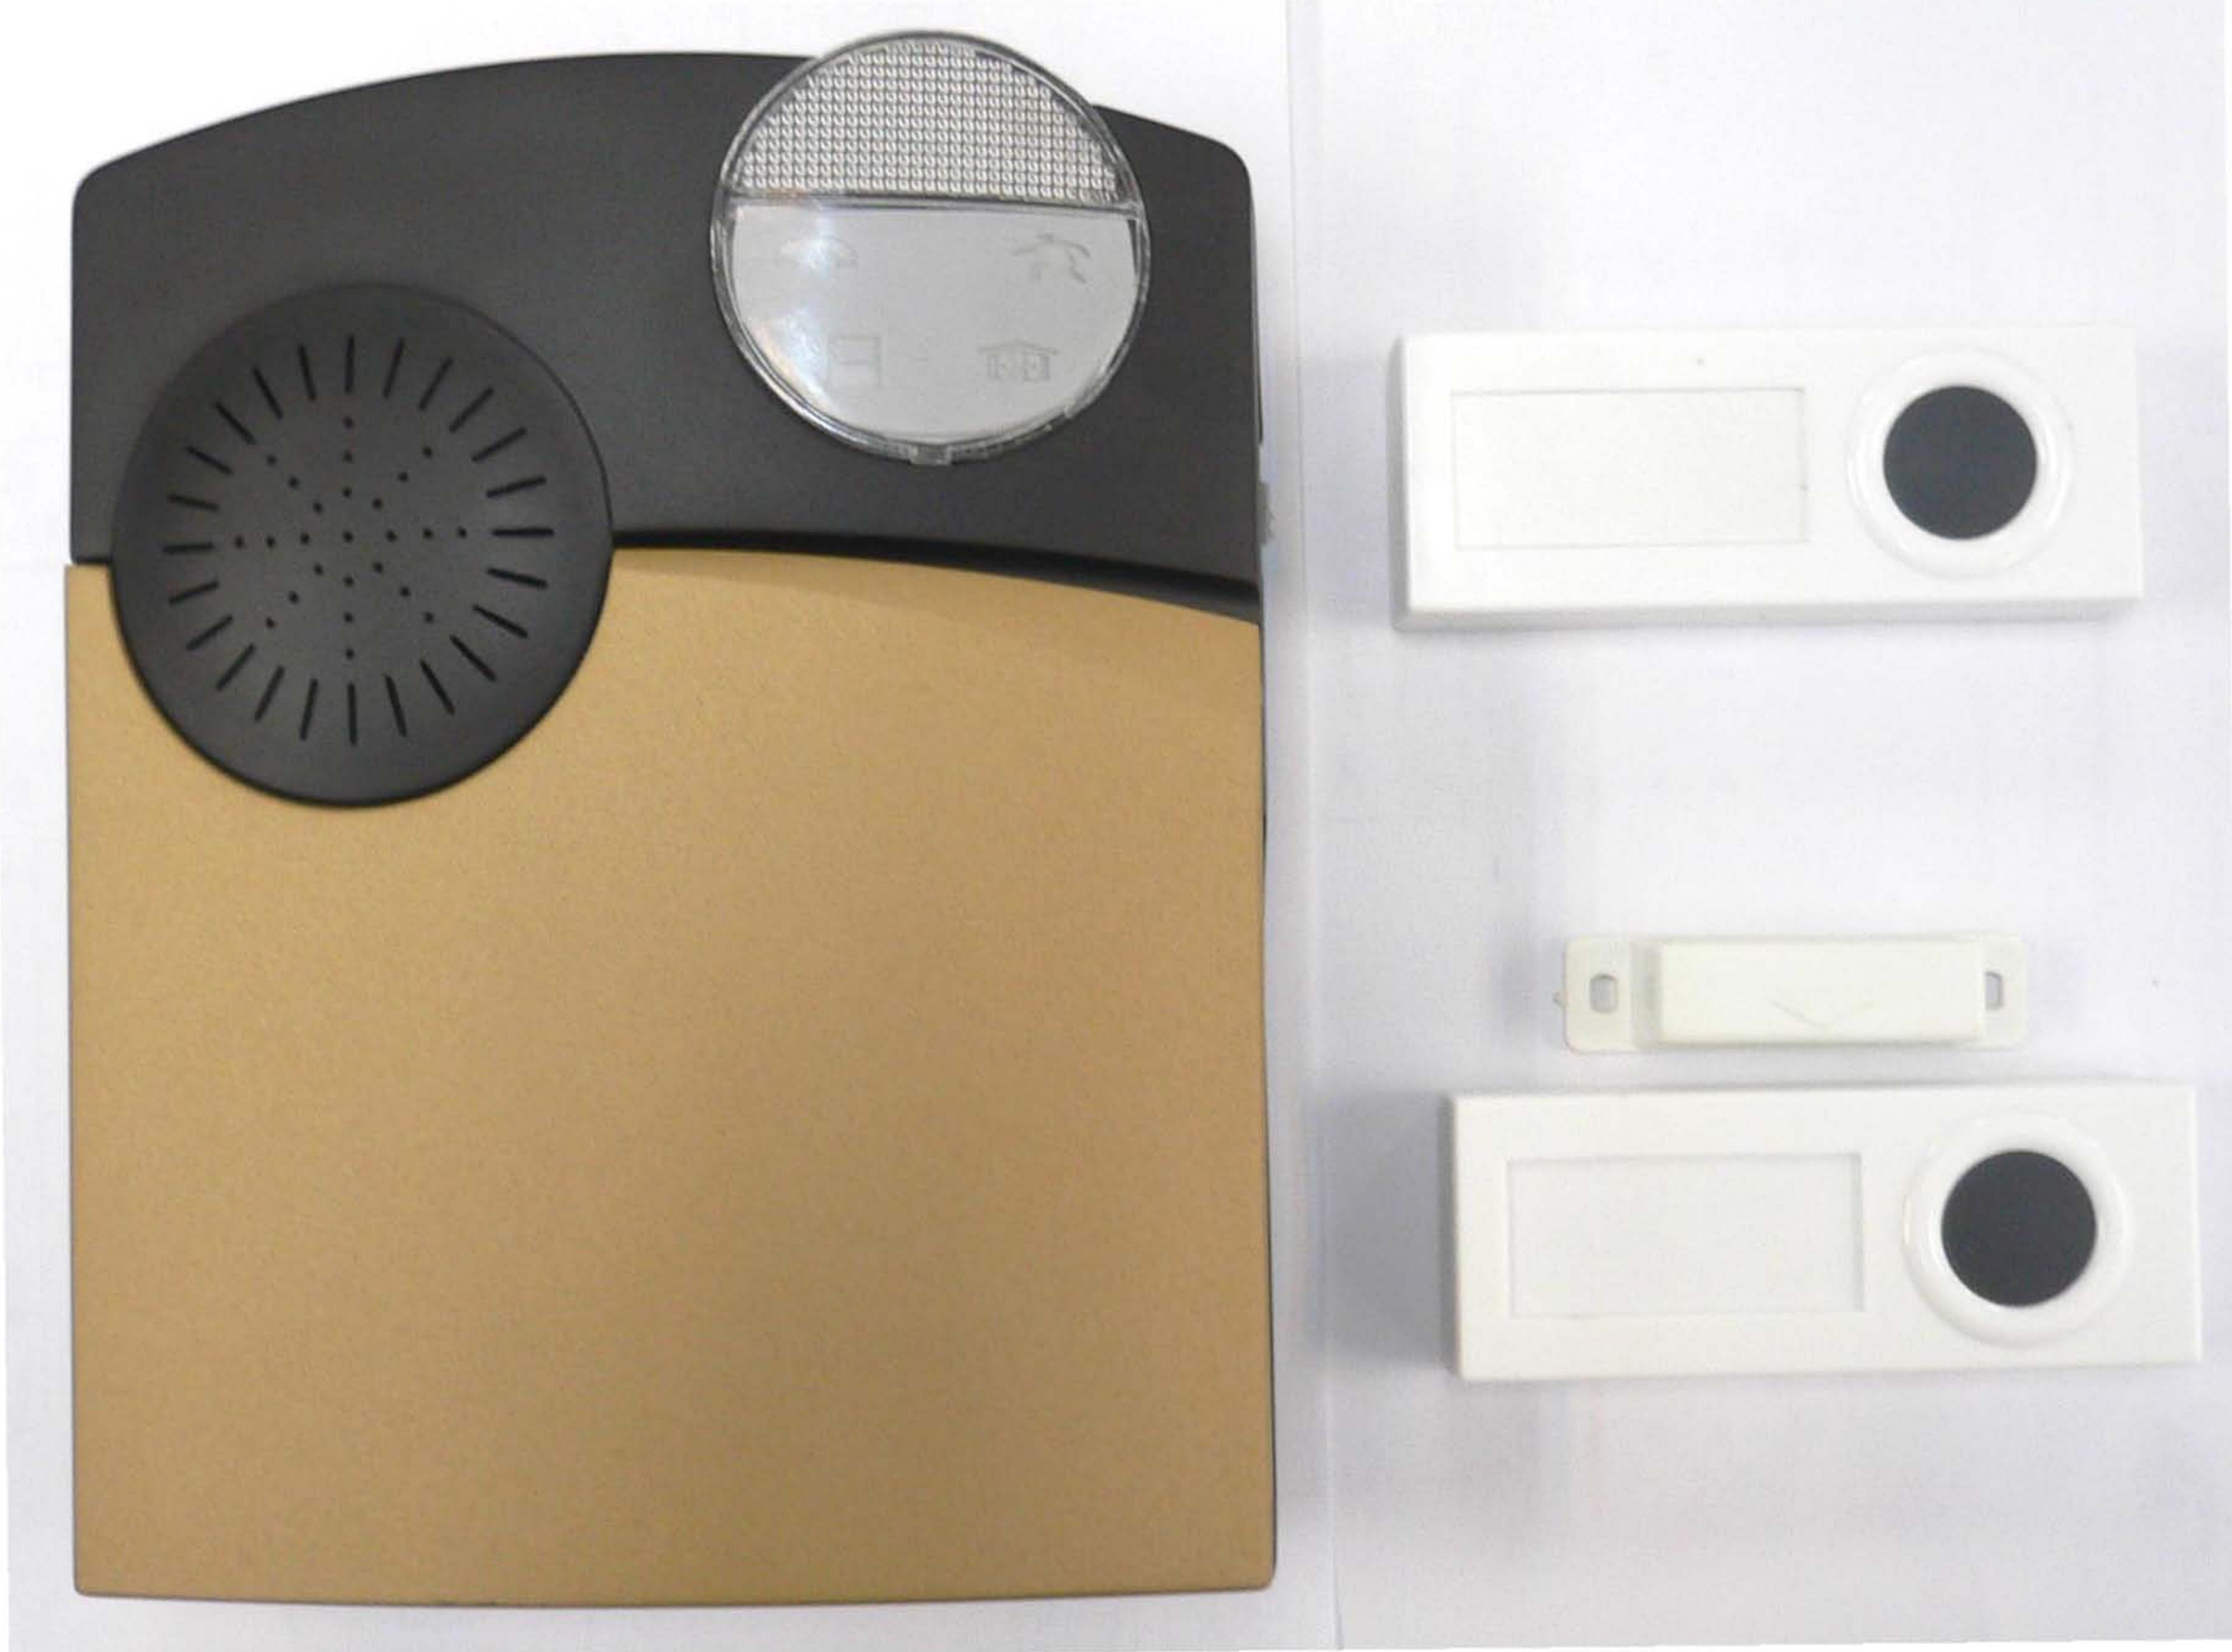 Venture Global Dcx 800 Wireless Door Chime User Manual Block Diagram Doorbell Memory Circuit